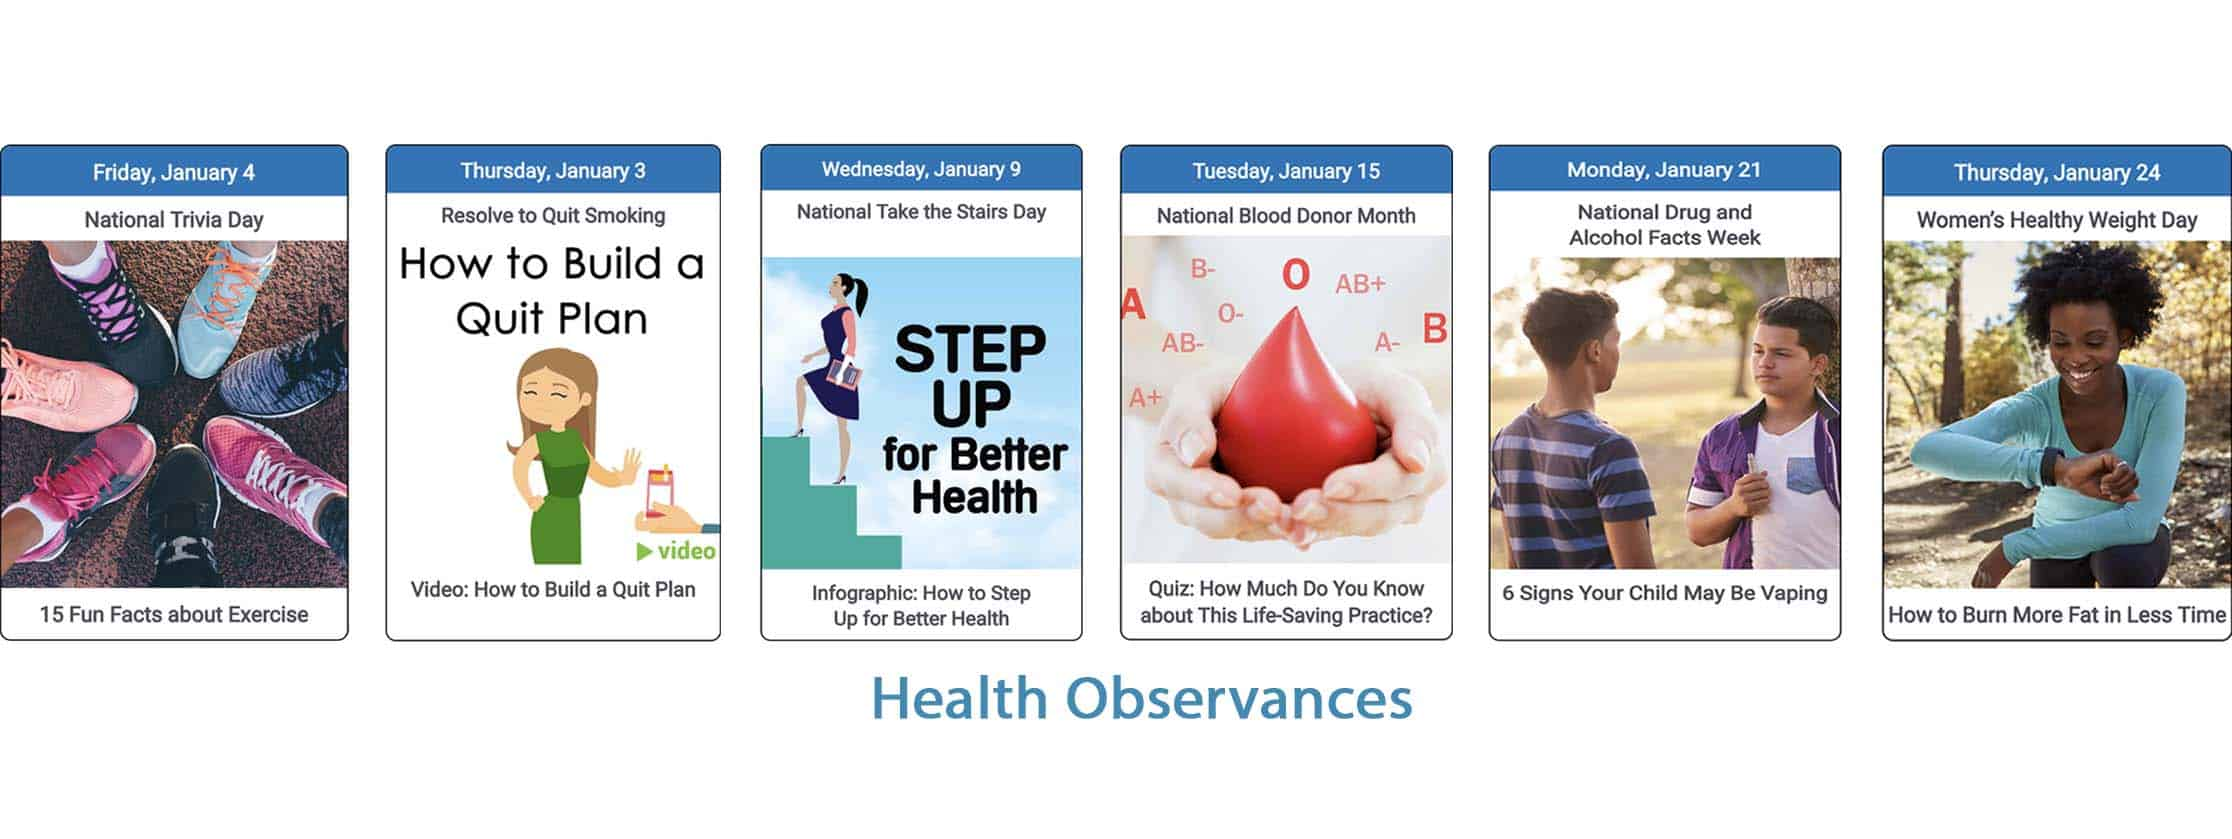 health observances